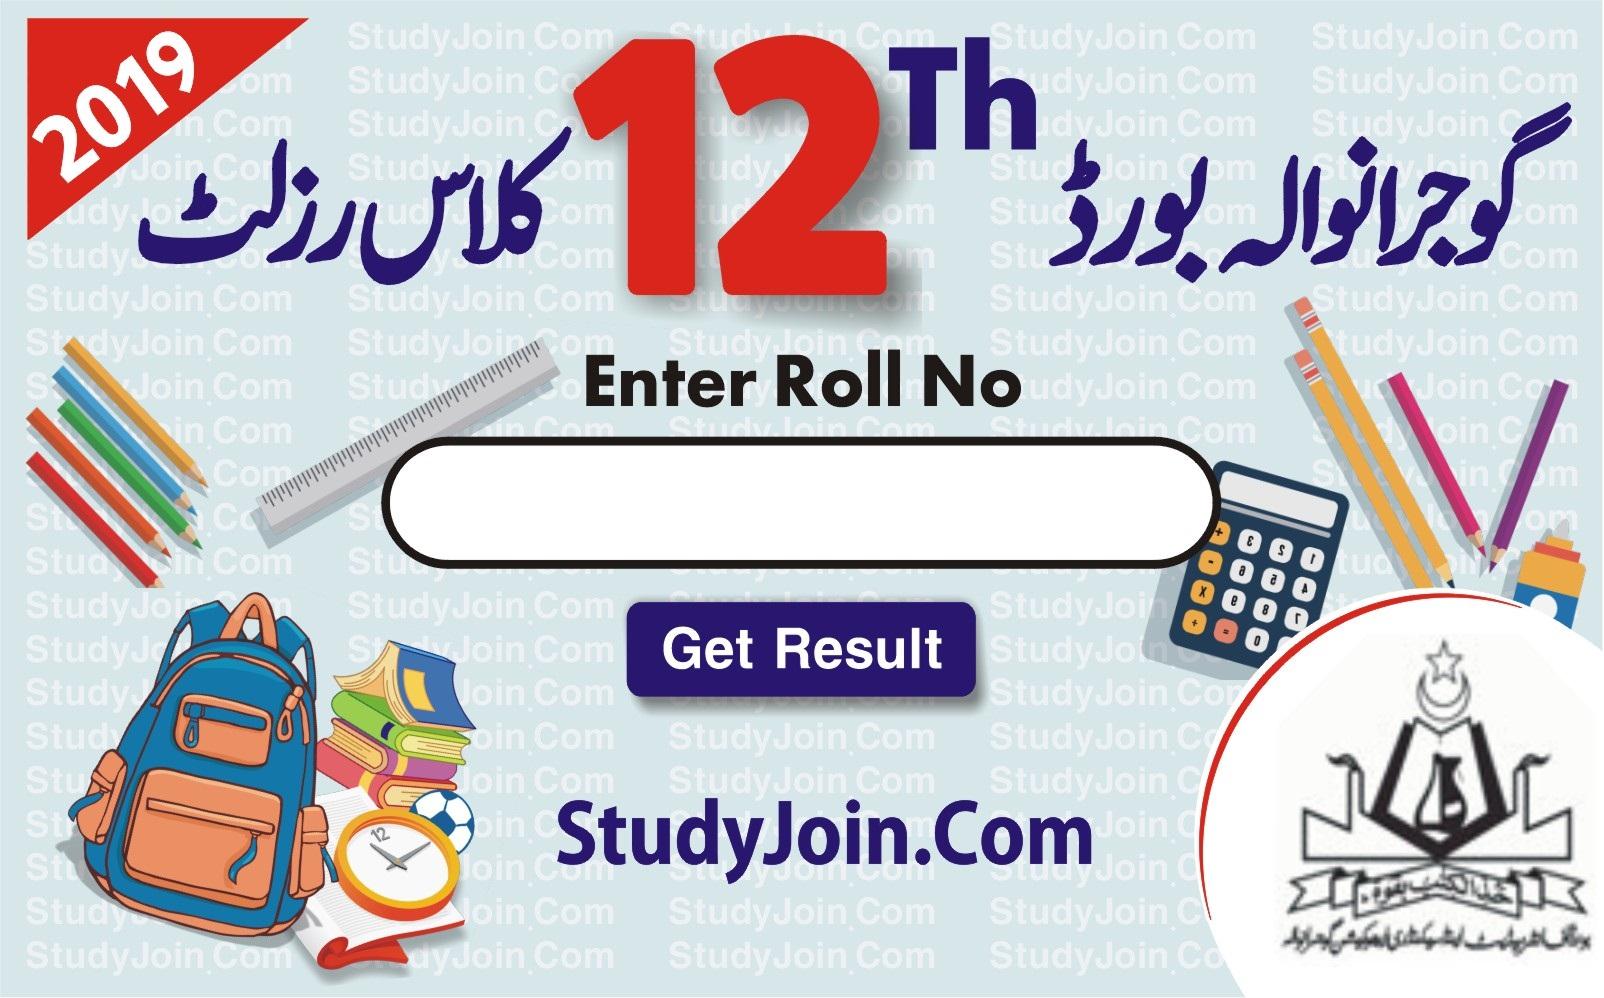 BISE Gujranwala 12th result 2019, Gujranwala board result 2019, 12 class result 2019 Gujranwala board, 2nd year result 2019 Gujranwala board, BISE Gujranwala result 2019, 11th class result 2019 Gujranwala board, 1st year result 2019 Gujranwala board, Gujranwala board result 2019 12th class, BISE Gujranwala 12th result 2019, BISE Gujranwala 12th result 2019 enter roll number, Gujranwala board result 2019, BISE Gujranwala SSC, HSSC, FA, FSc, ICS ICom Result 2019, ilmkidunya result 2019, ilm ki duniya result 2019 12th class